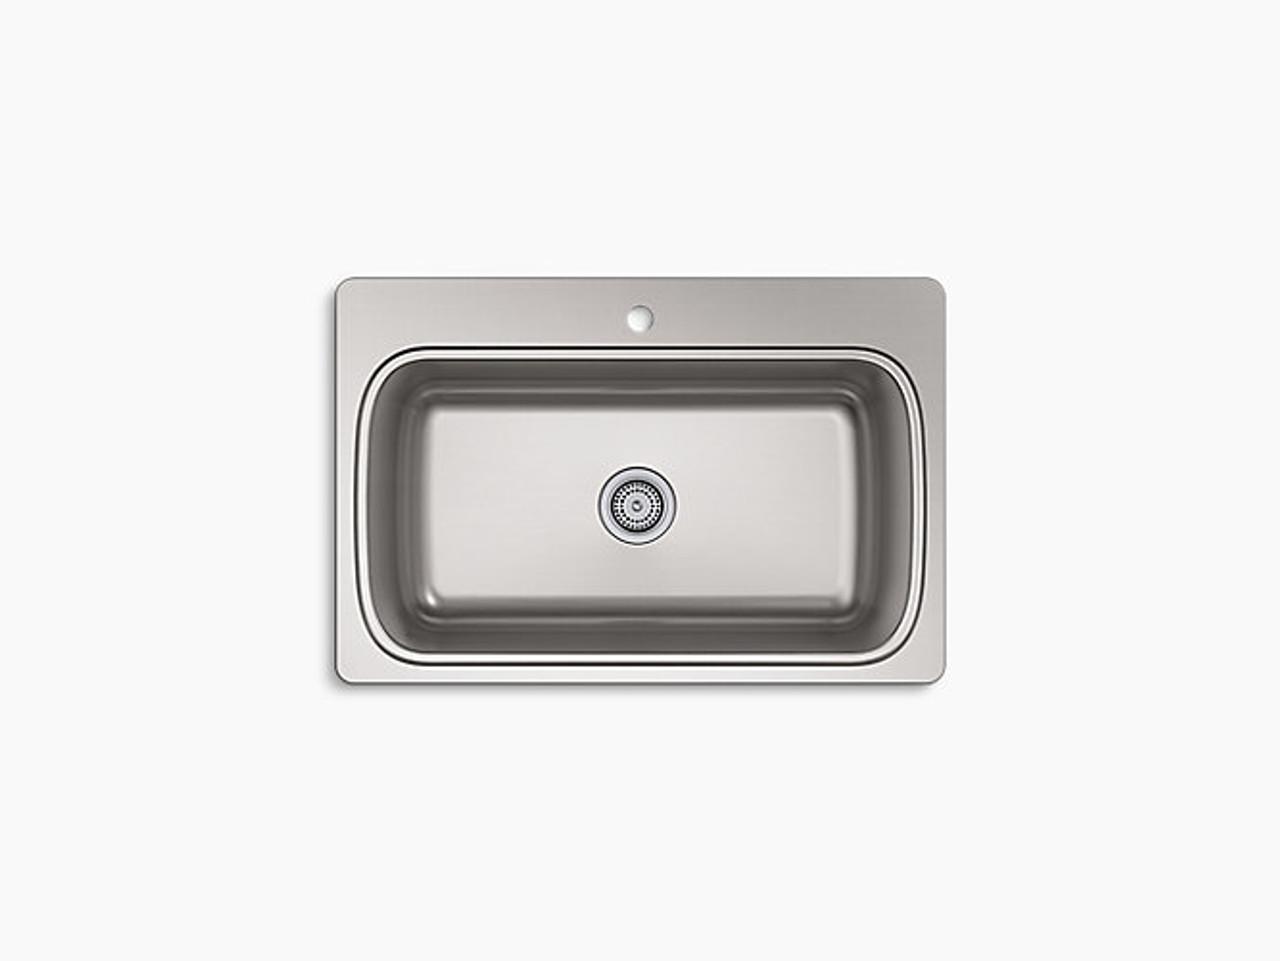 Kohler Verse 33 X 22 X 9 Top Mount Single Bowl Kitchen Sink With Single Faucet Hole Royal Bath Place